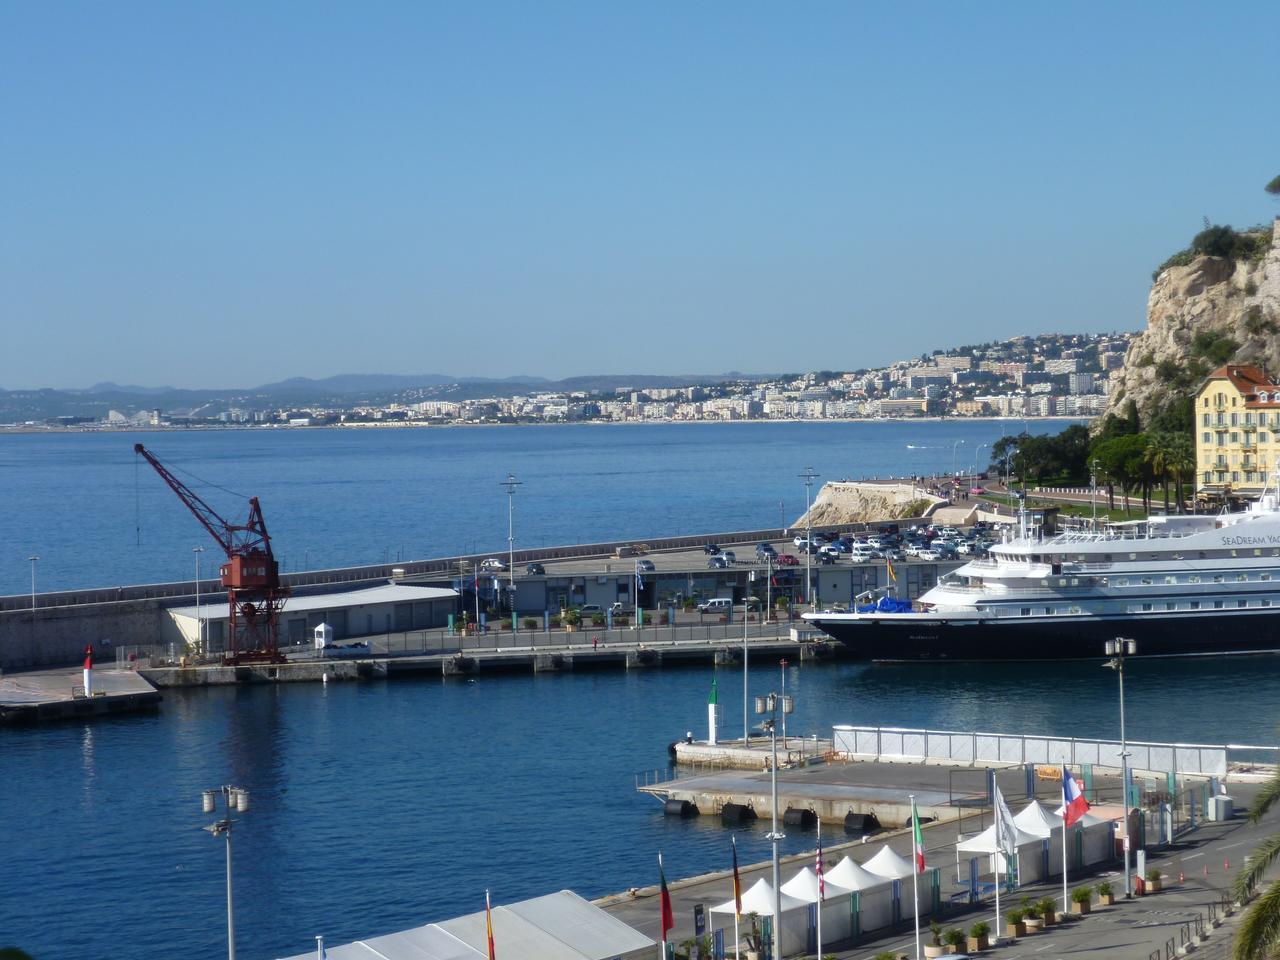 Immobilier nice vue mer appartement nice 3 pieces en - Appartement a vendre port vendres vue mer ...